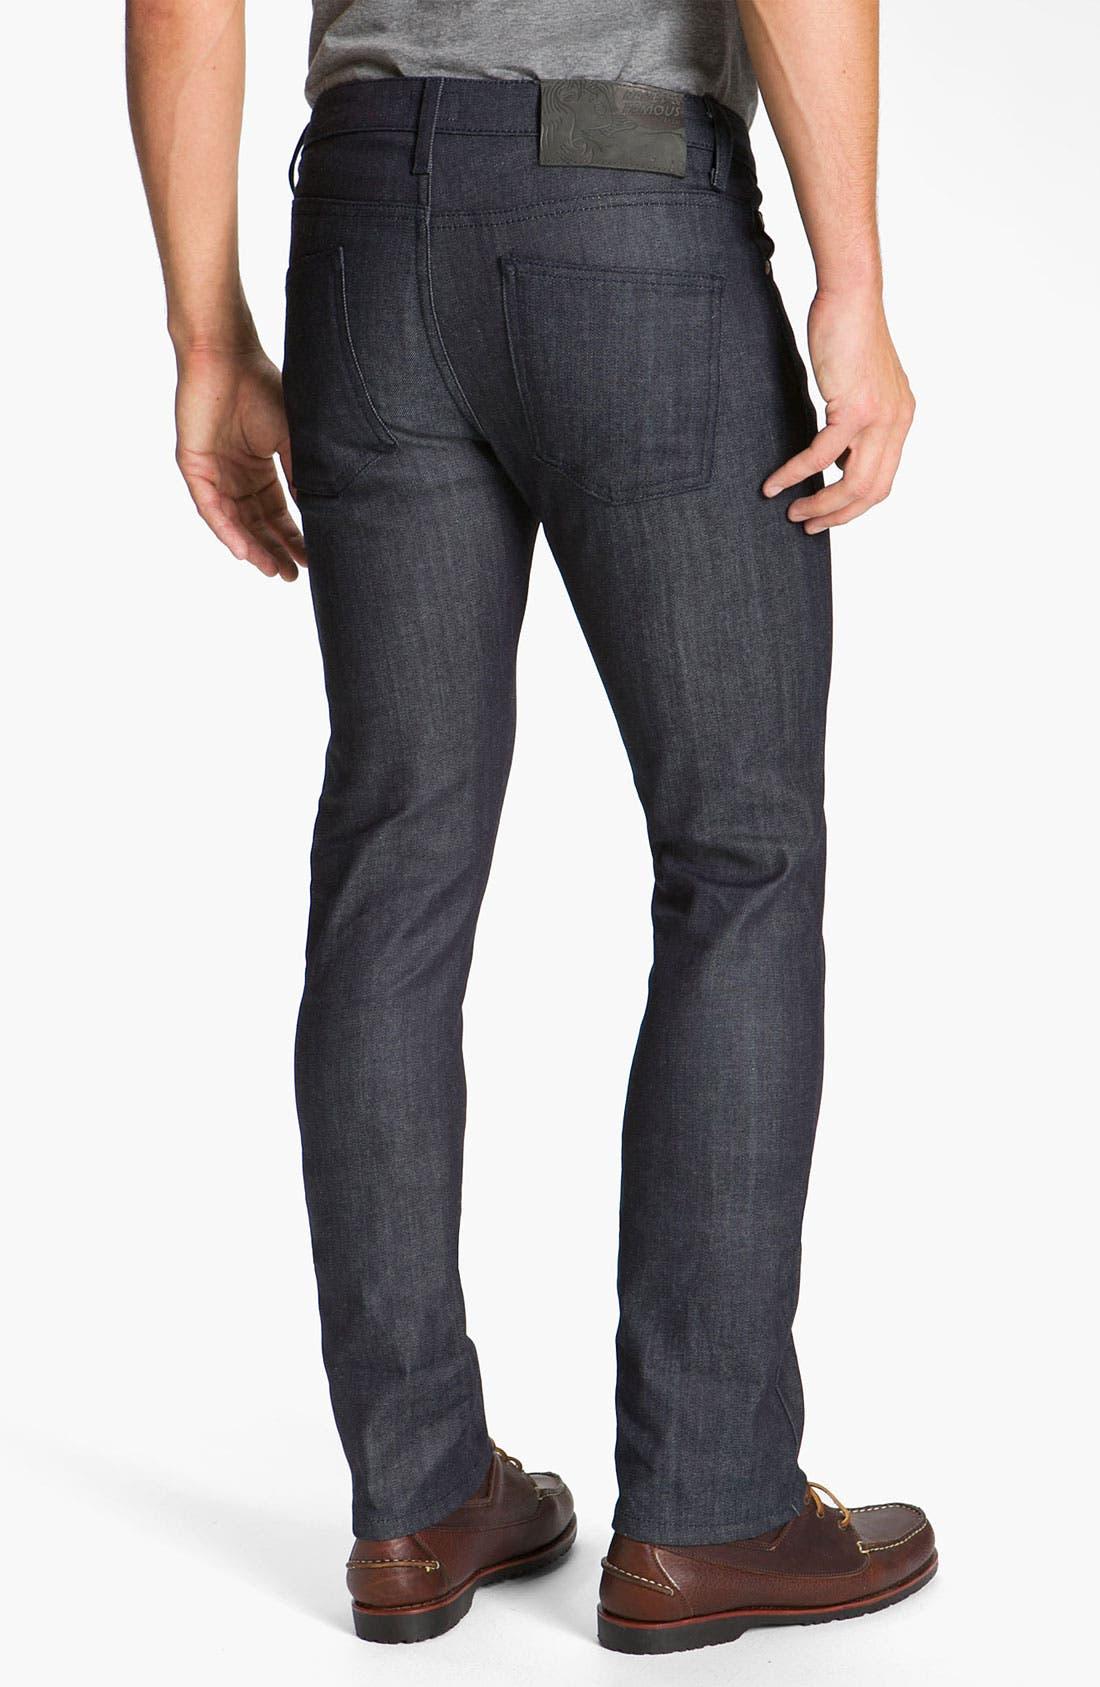 Main Image - Naked & Famous Denim 'Skinny Guy' Slim Cotton Cashmere Skinny Leg Jeans (Dark Indigo)